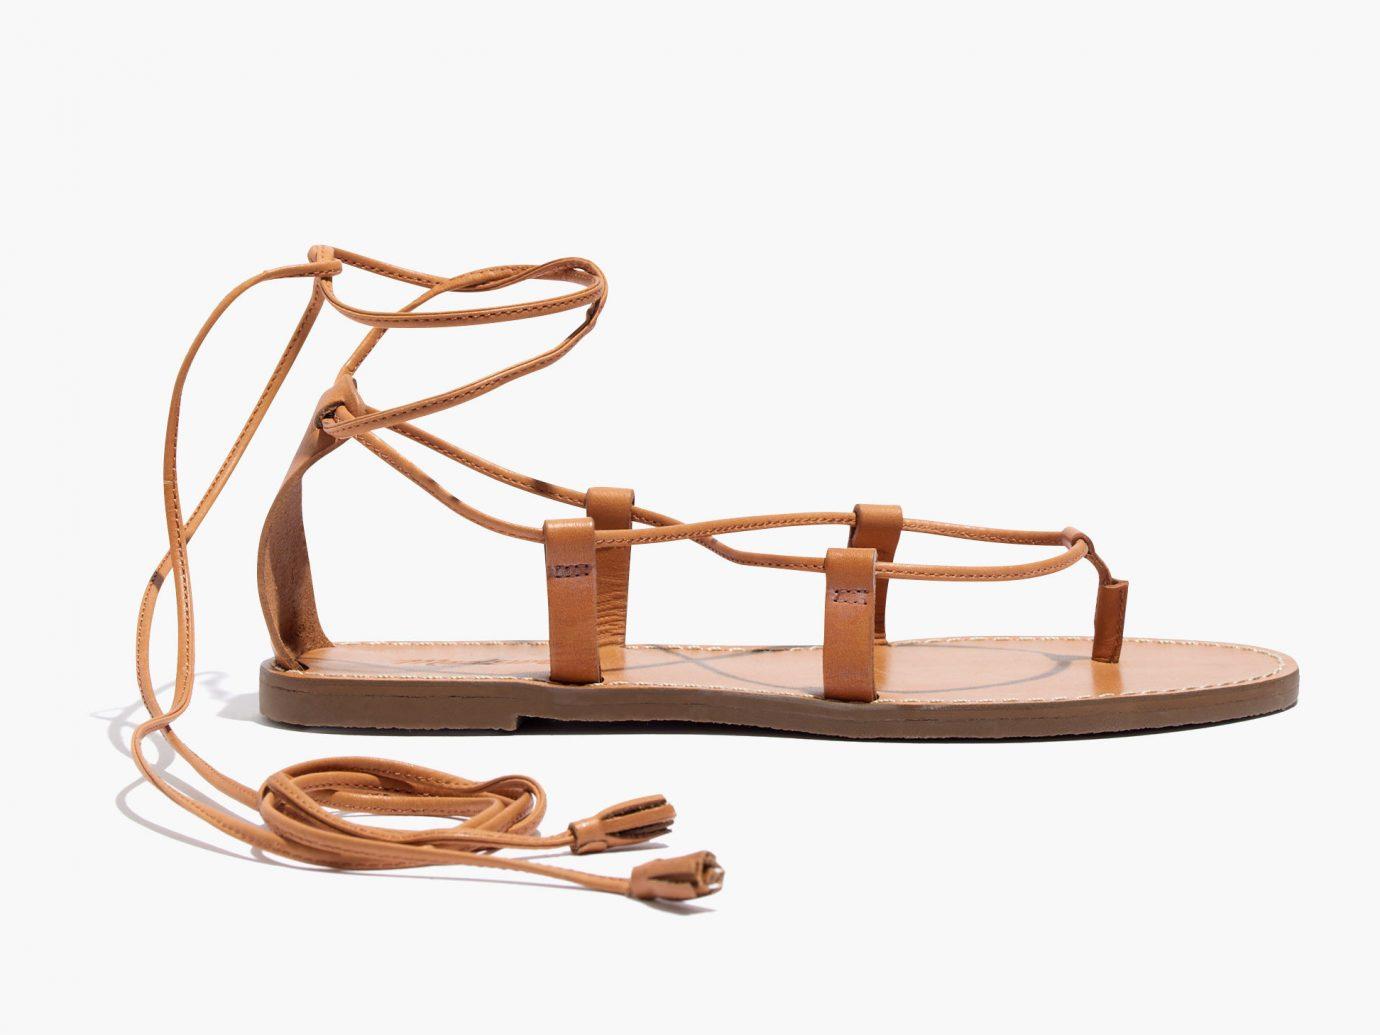 Style + Design footwear wooden product shoe sandal leg rein leather